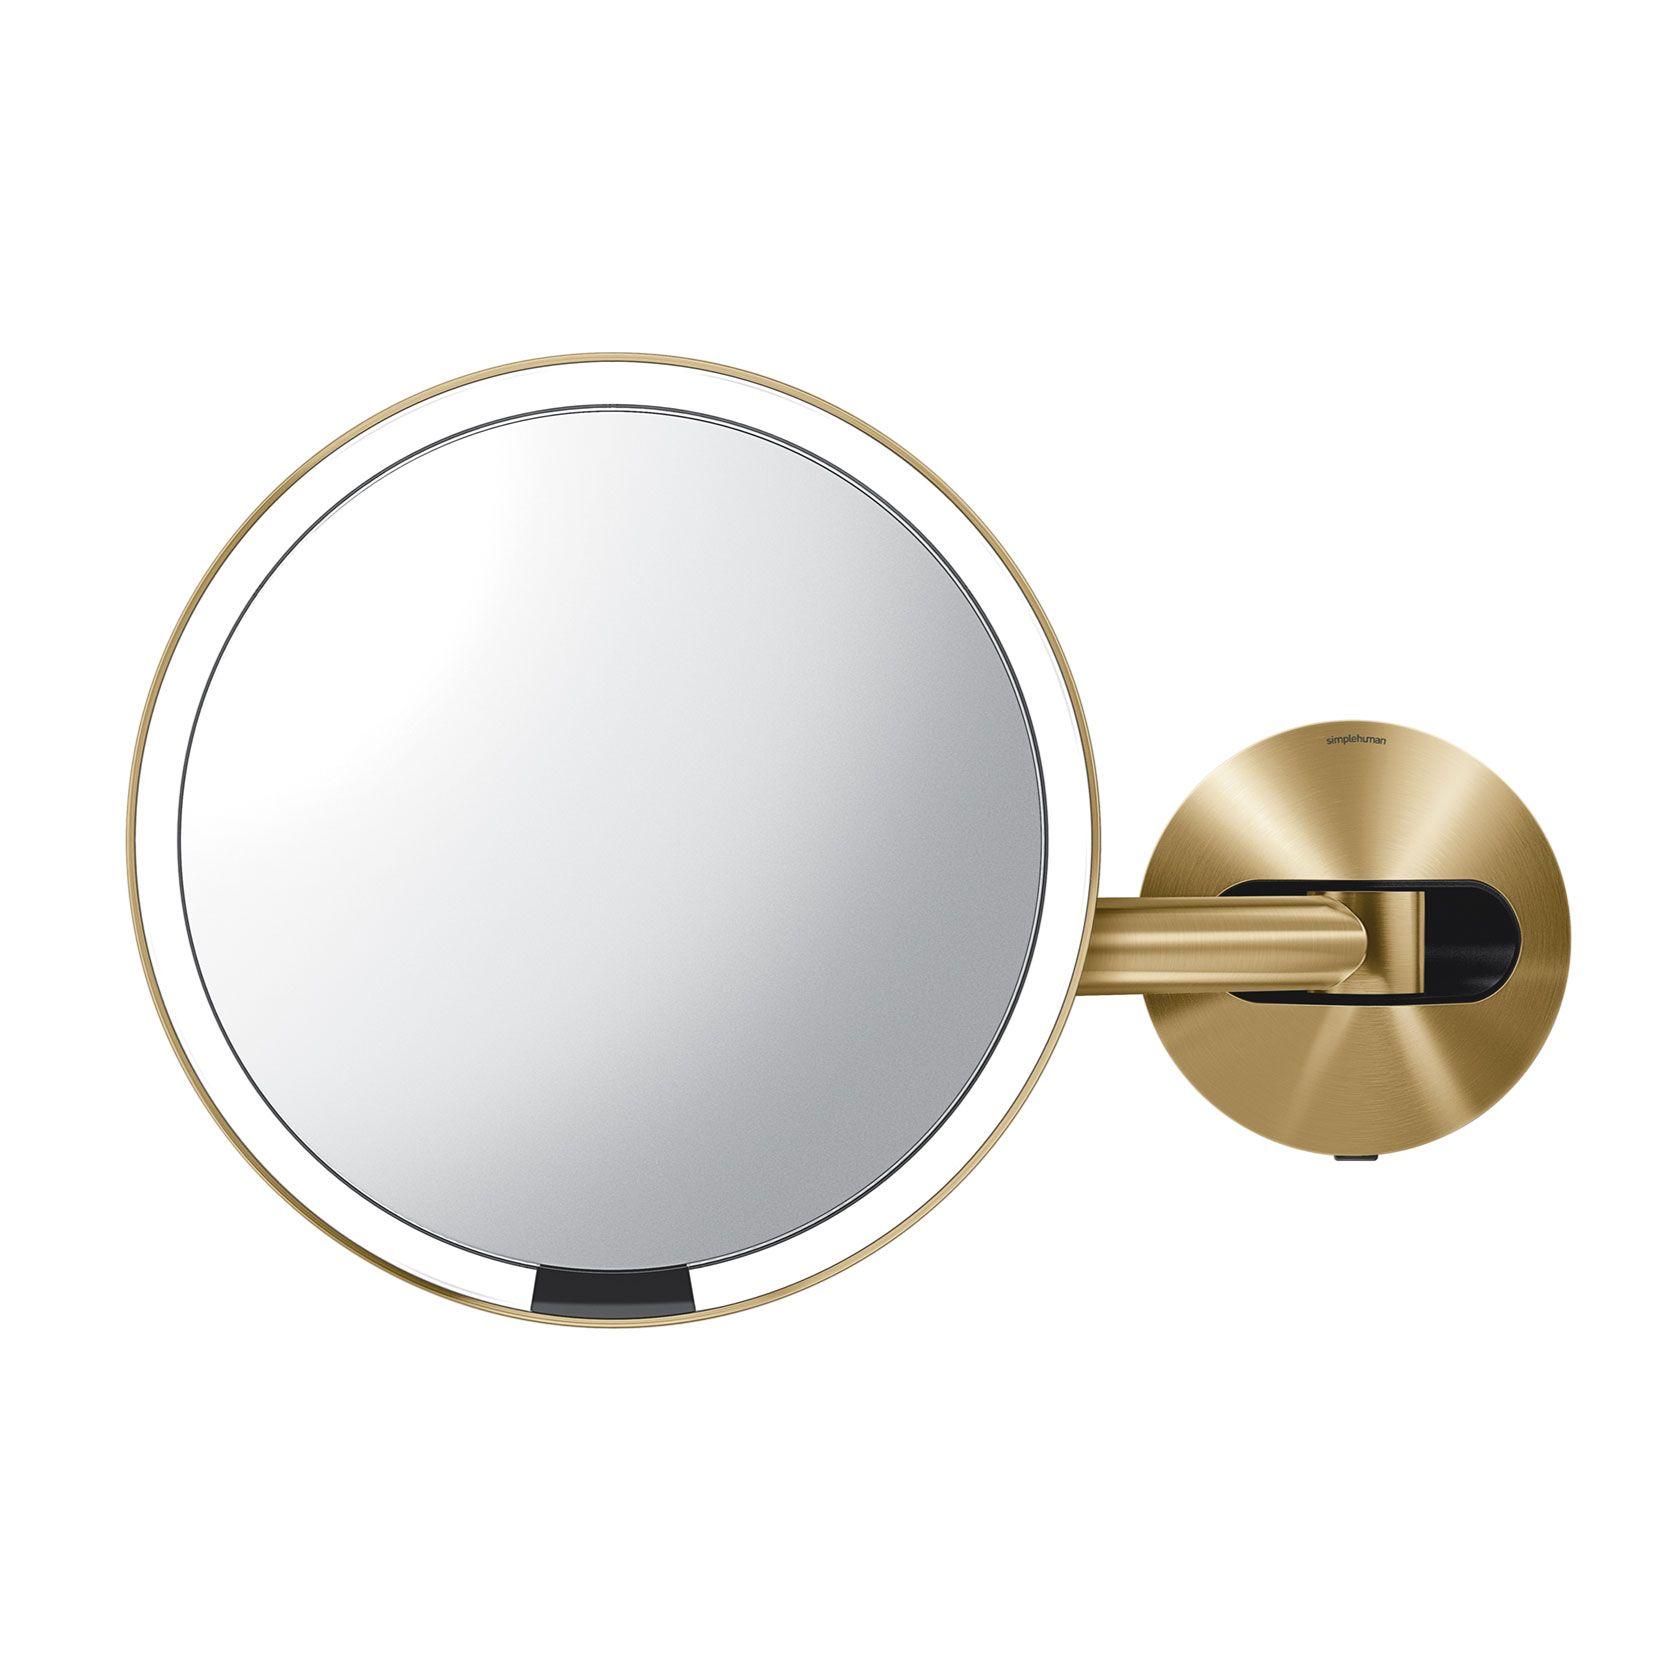 Hard Wired Wall Mount Sensor Mirror Makeup Mirror With Lights Mirror With Lights Makeup Mirror